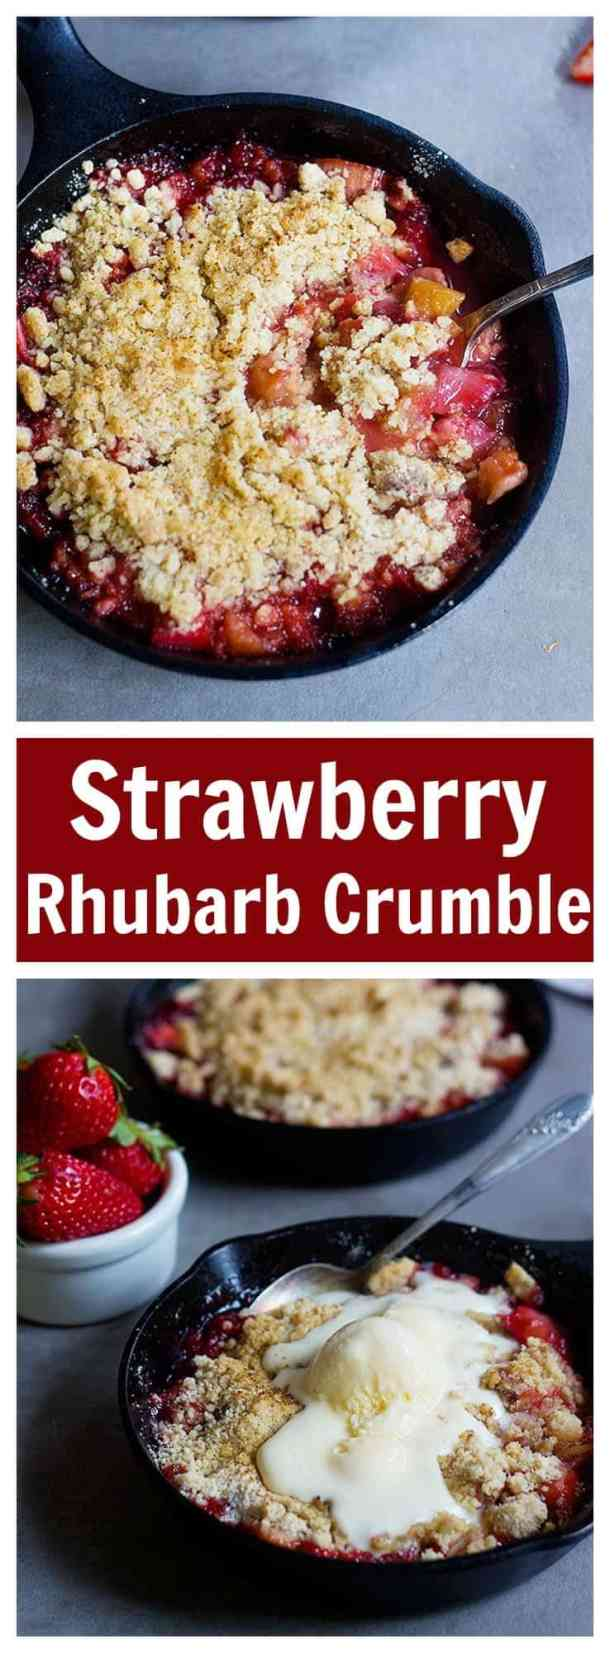 Strawberry Rhubarb Crumble | Strawberry Rhubarb Crisp | Spring Crisp | Spring Crumble | Strawberry Crumble | Rhubarb Crumble | Rhubarb Crisp | Strawberry Crisp | Summer Desserts | Desserts | Easy Dessert Recipes | UnicornsintheKitchen.com